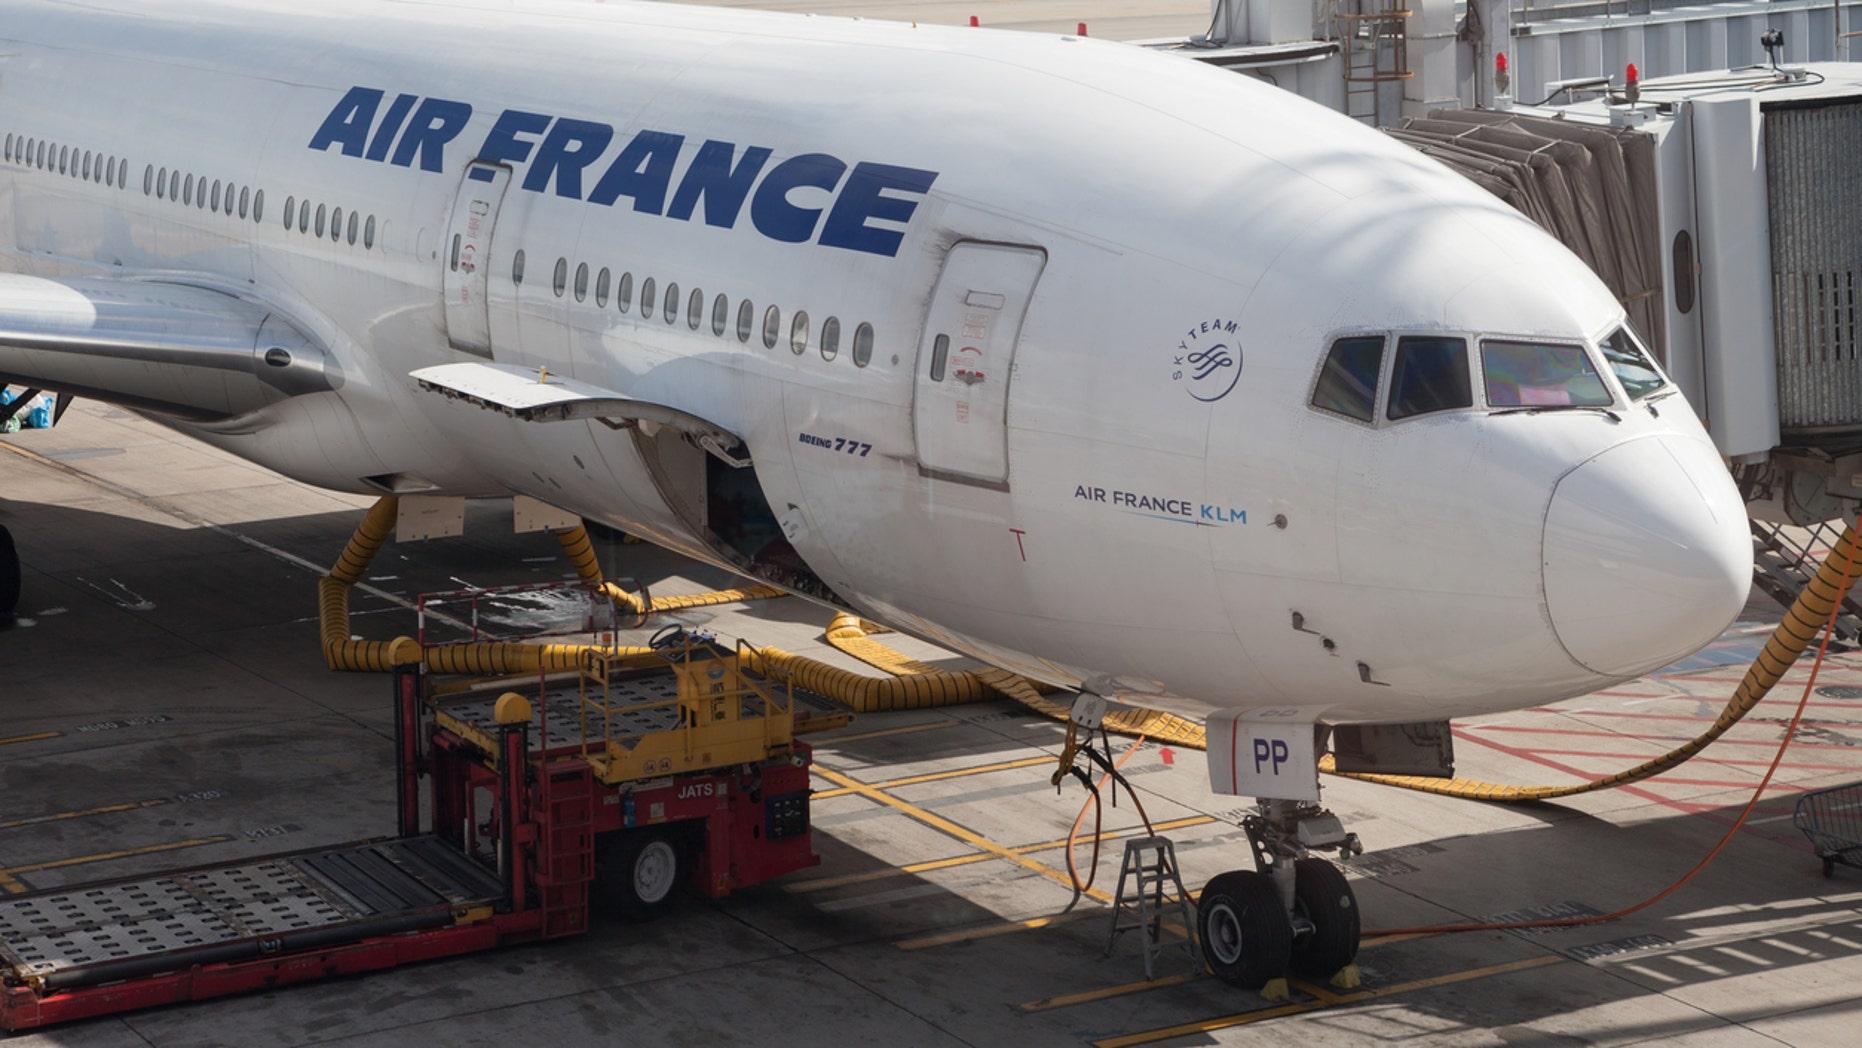 """Hong Kong, China - July 9, 2012: Air France Boeing 777 passenger plane parked at the Hong Kong International Airport in Hong Kong, China. Air France is one of the world's largest airlines."""